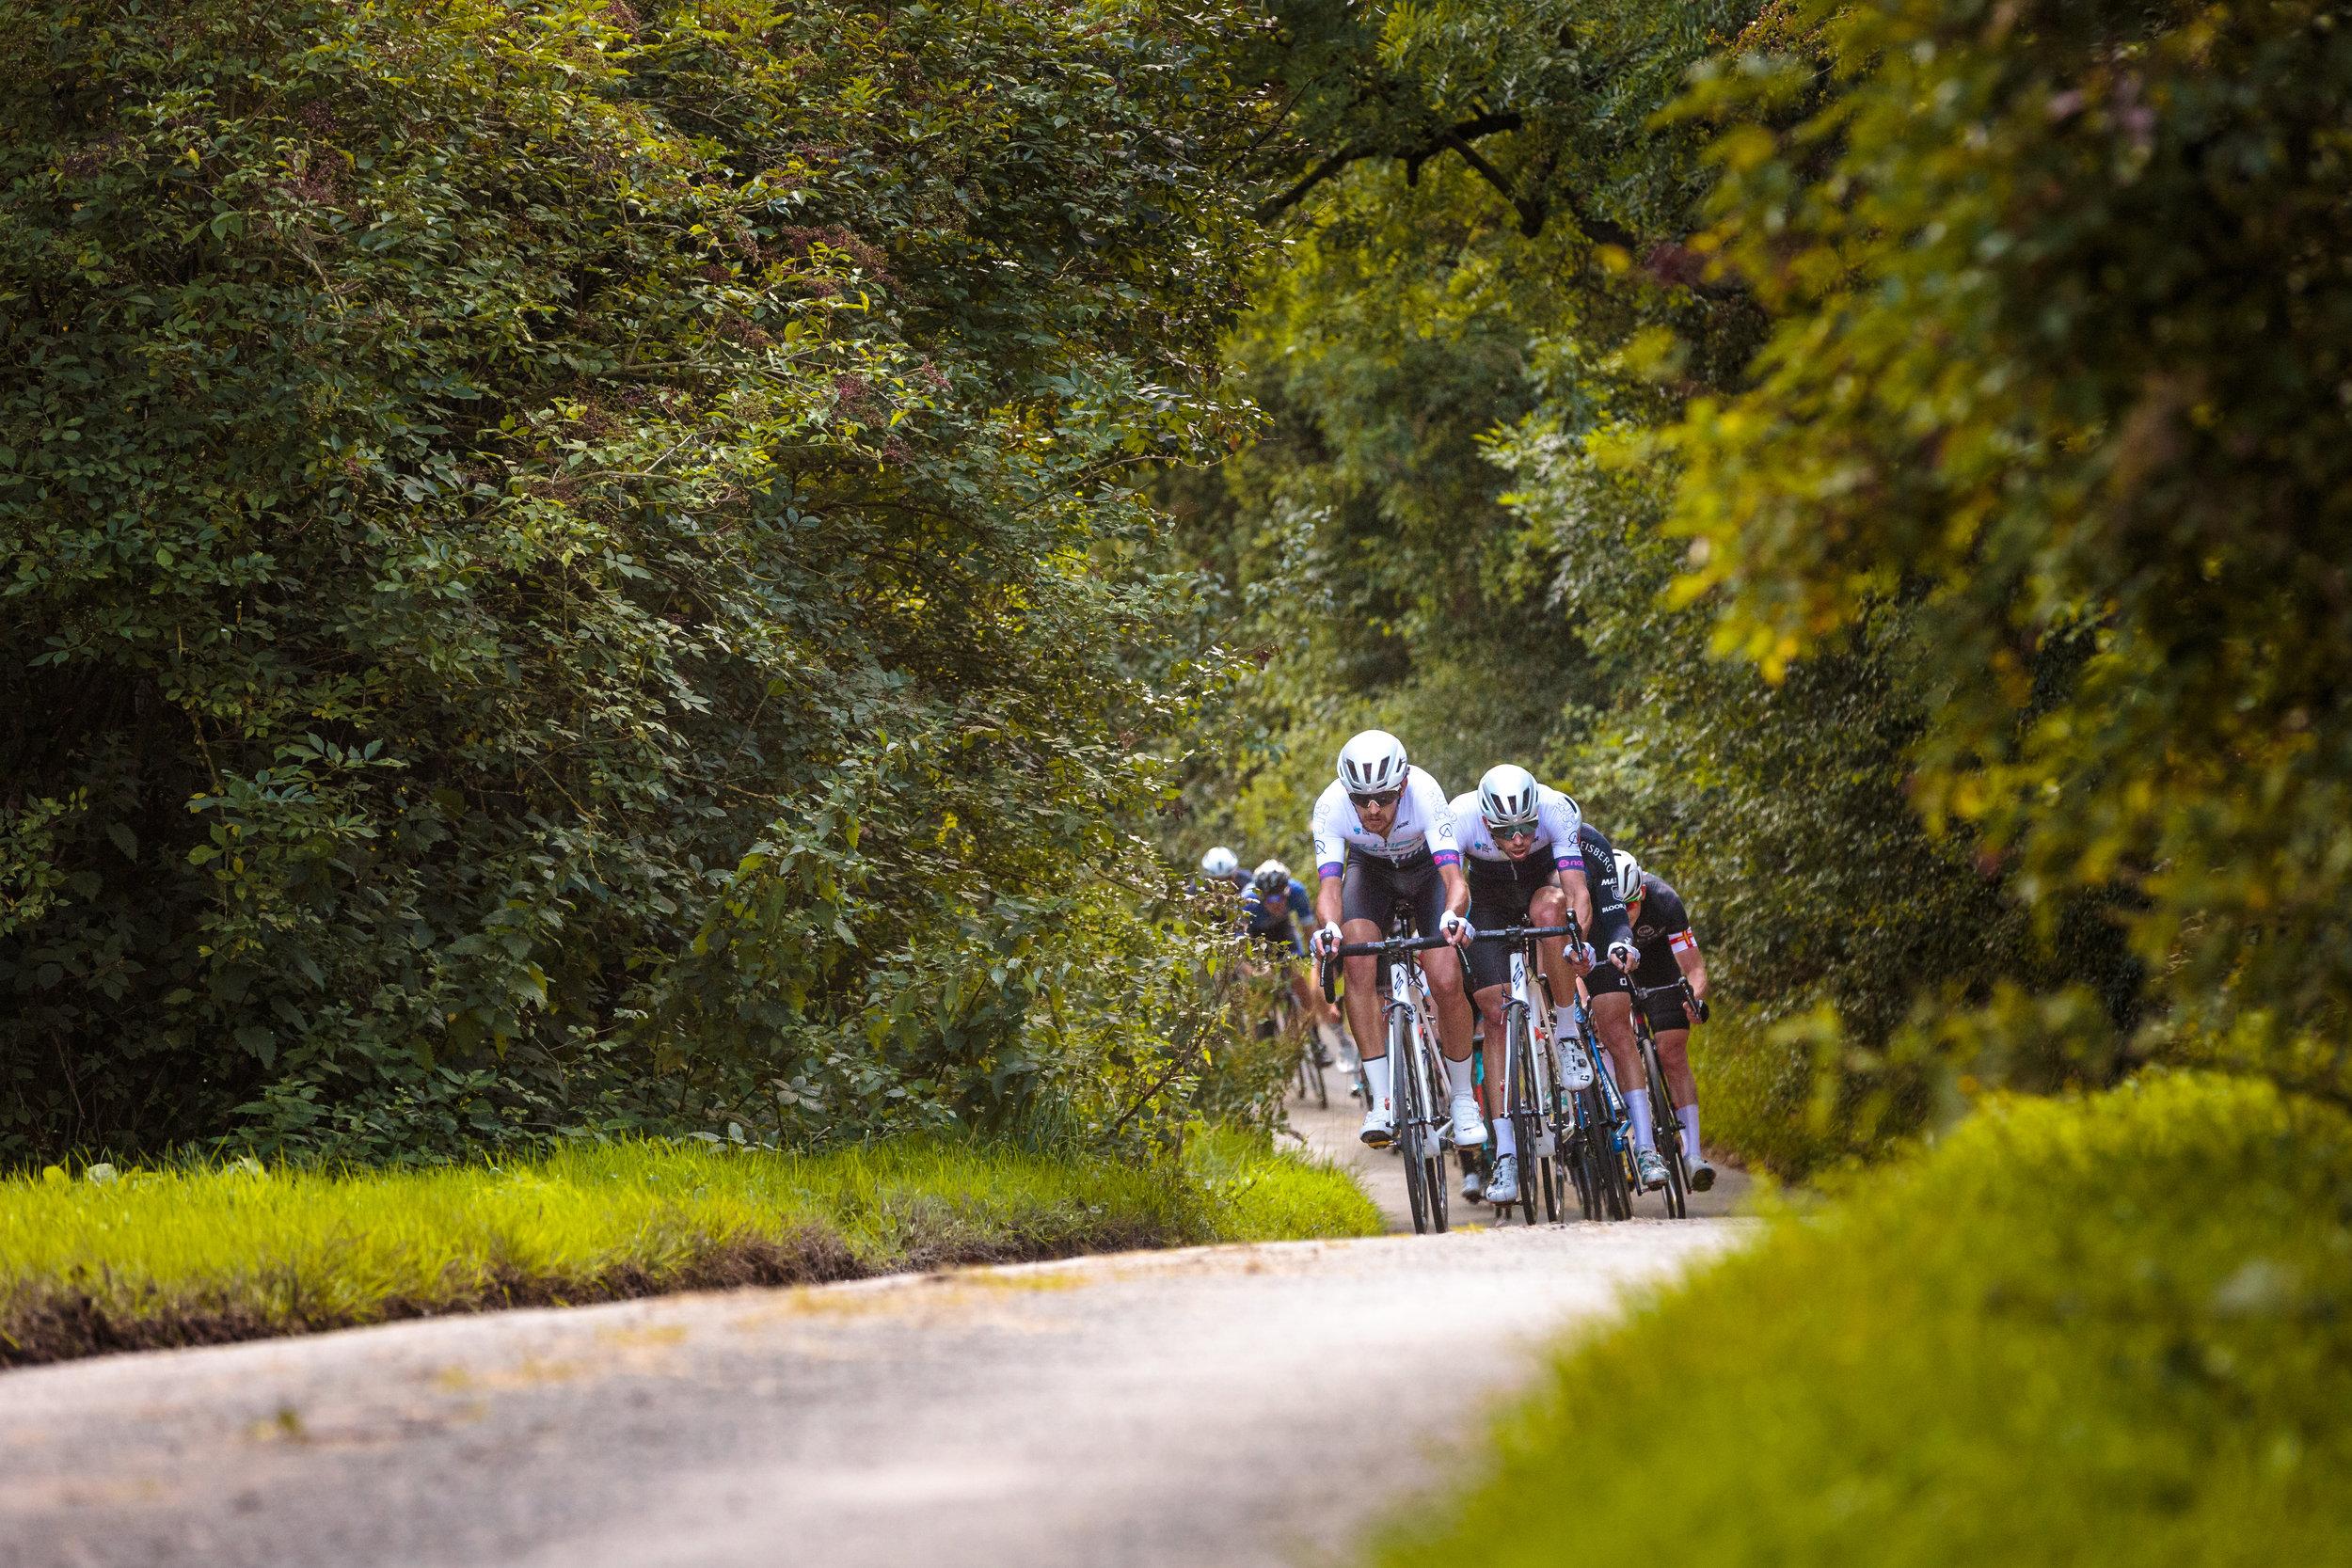 Swift Carbon Pro Racing Lead the Peloton